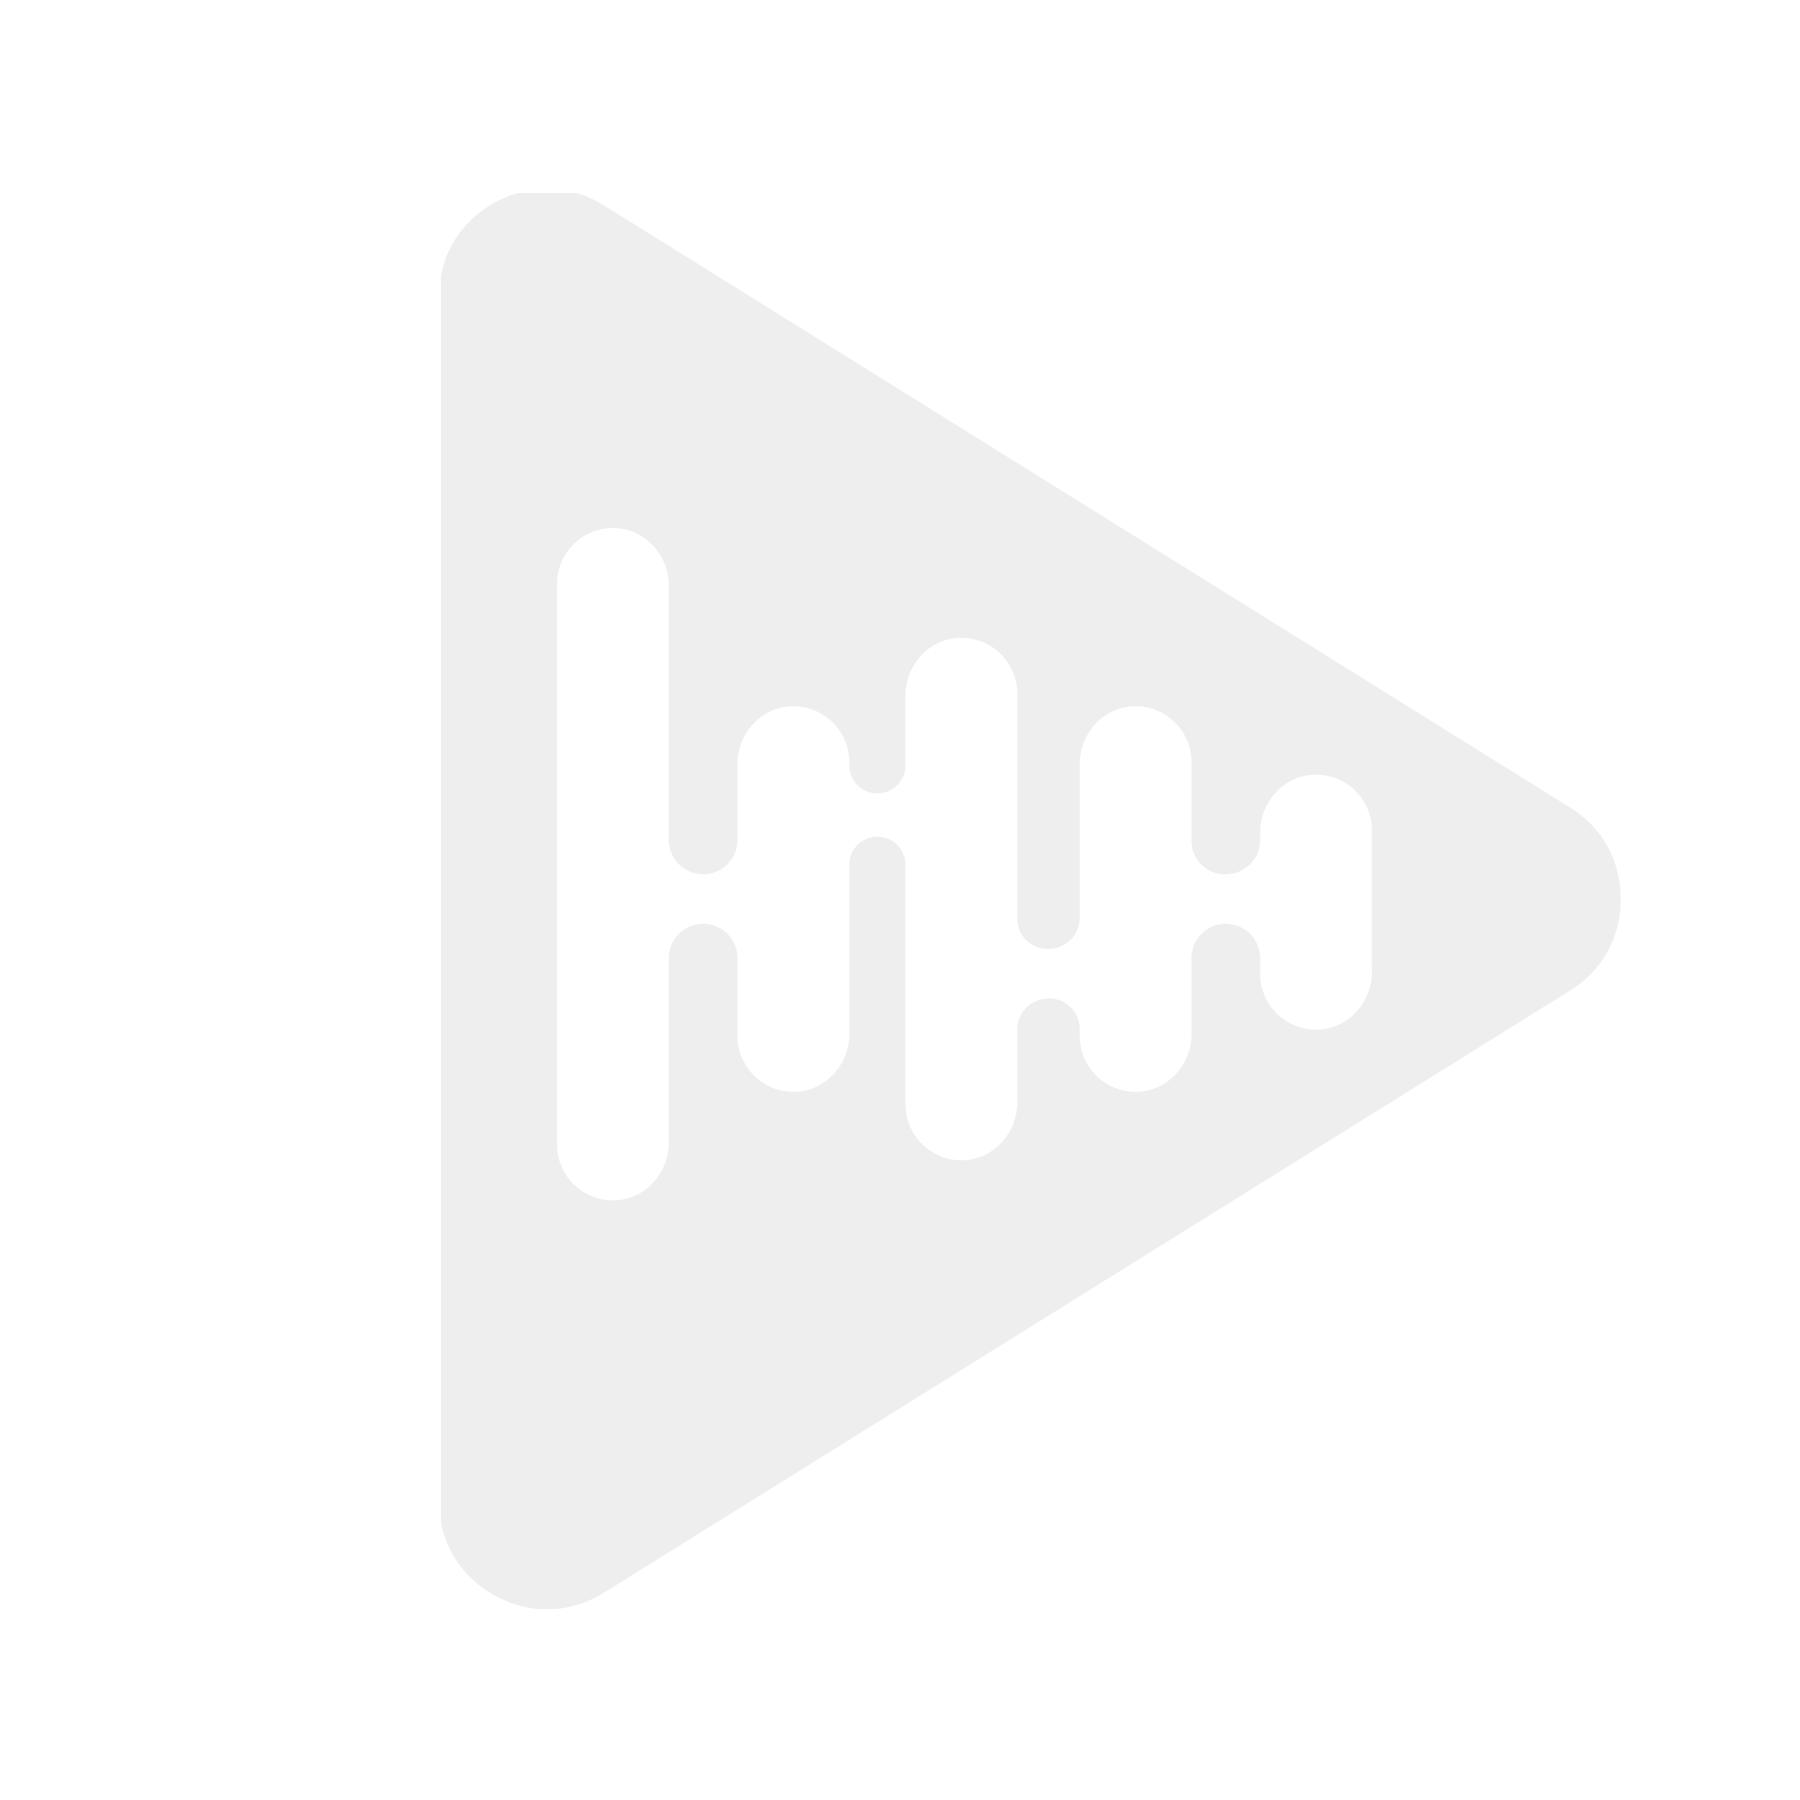 Kufatec 366711 - AUX-interface /m innfelling, Audi, Seat, Skoda, VW (> '07) m/Mini-ISO